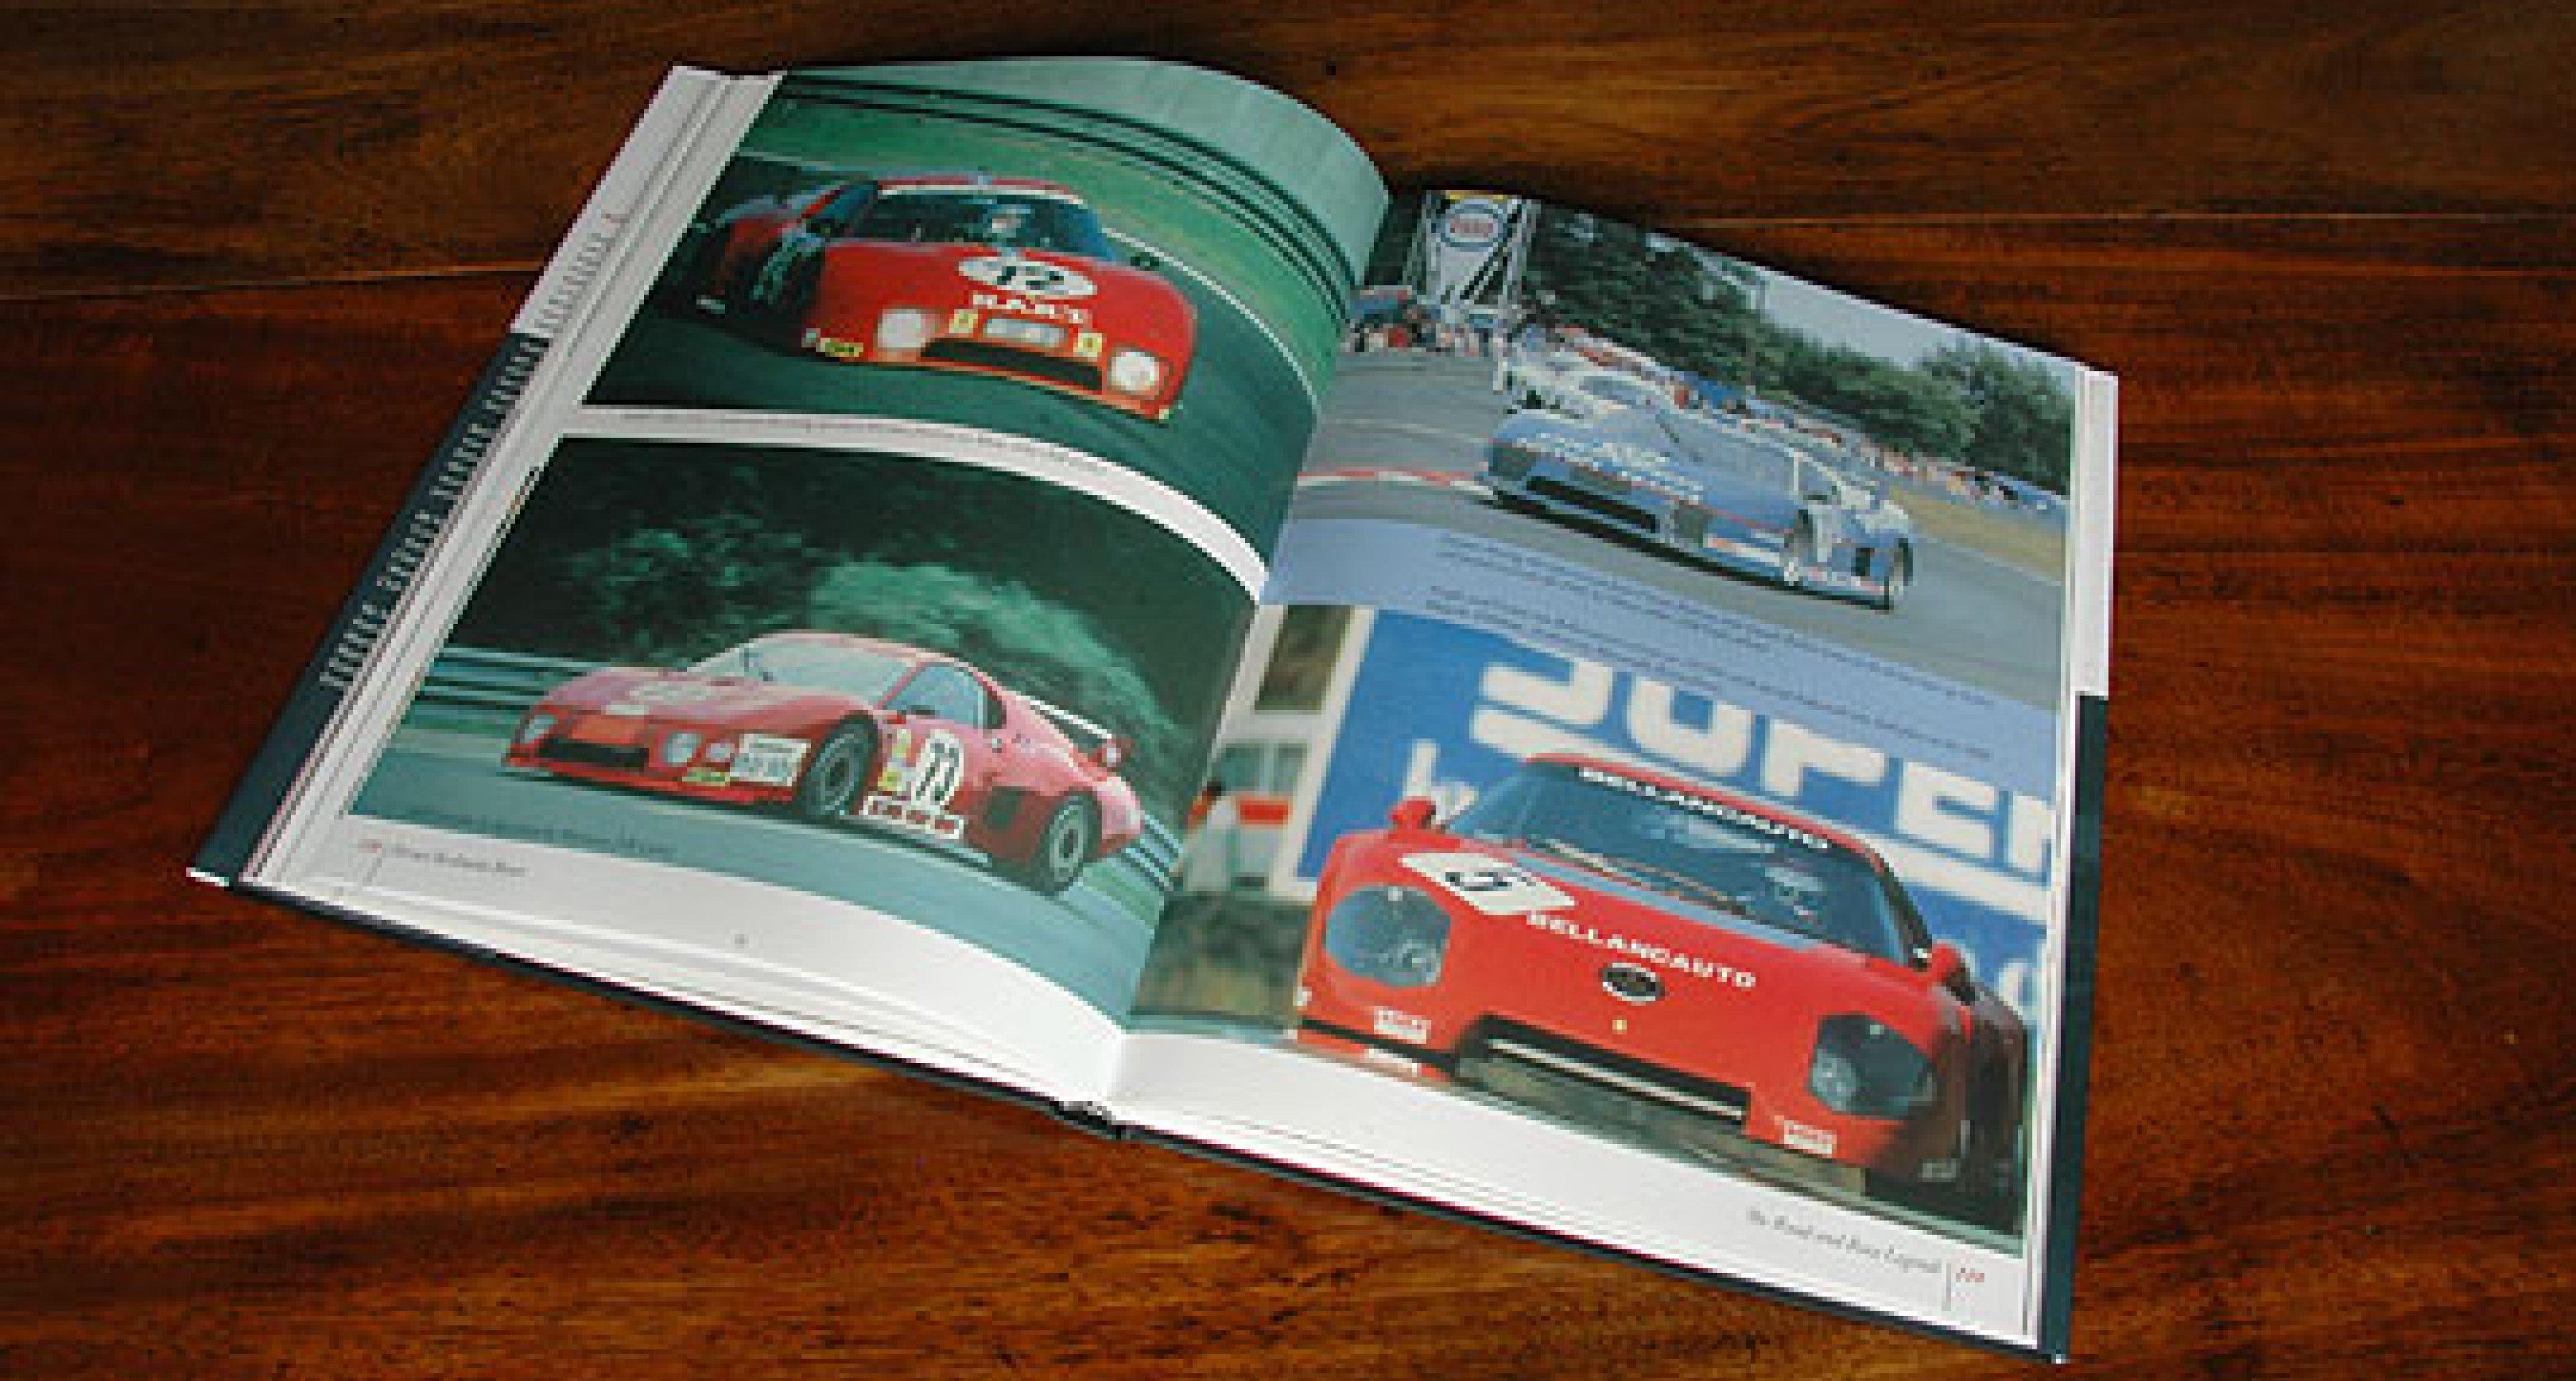 Ferrari Berlinetta Boxer – The Road and Racing Legends